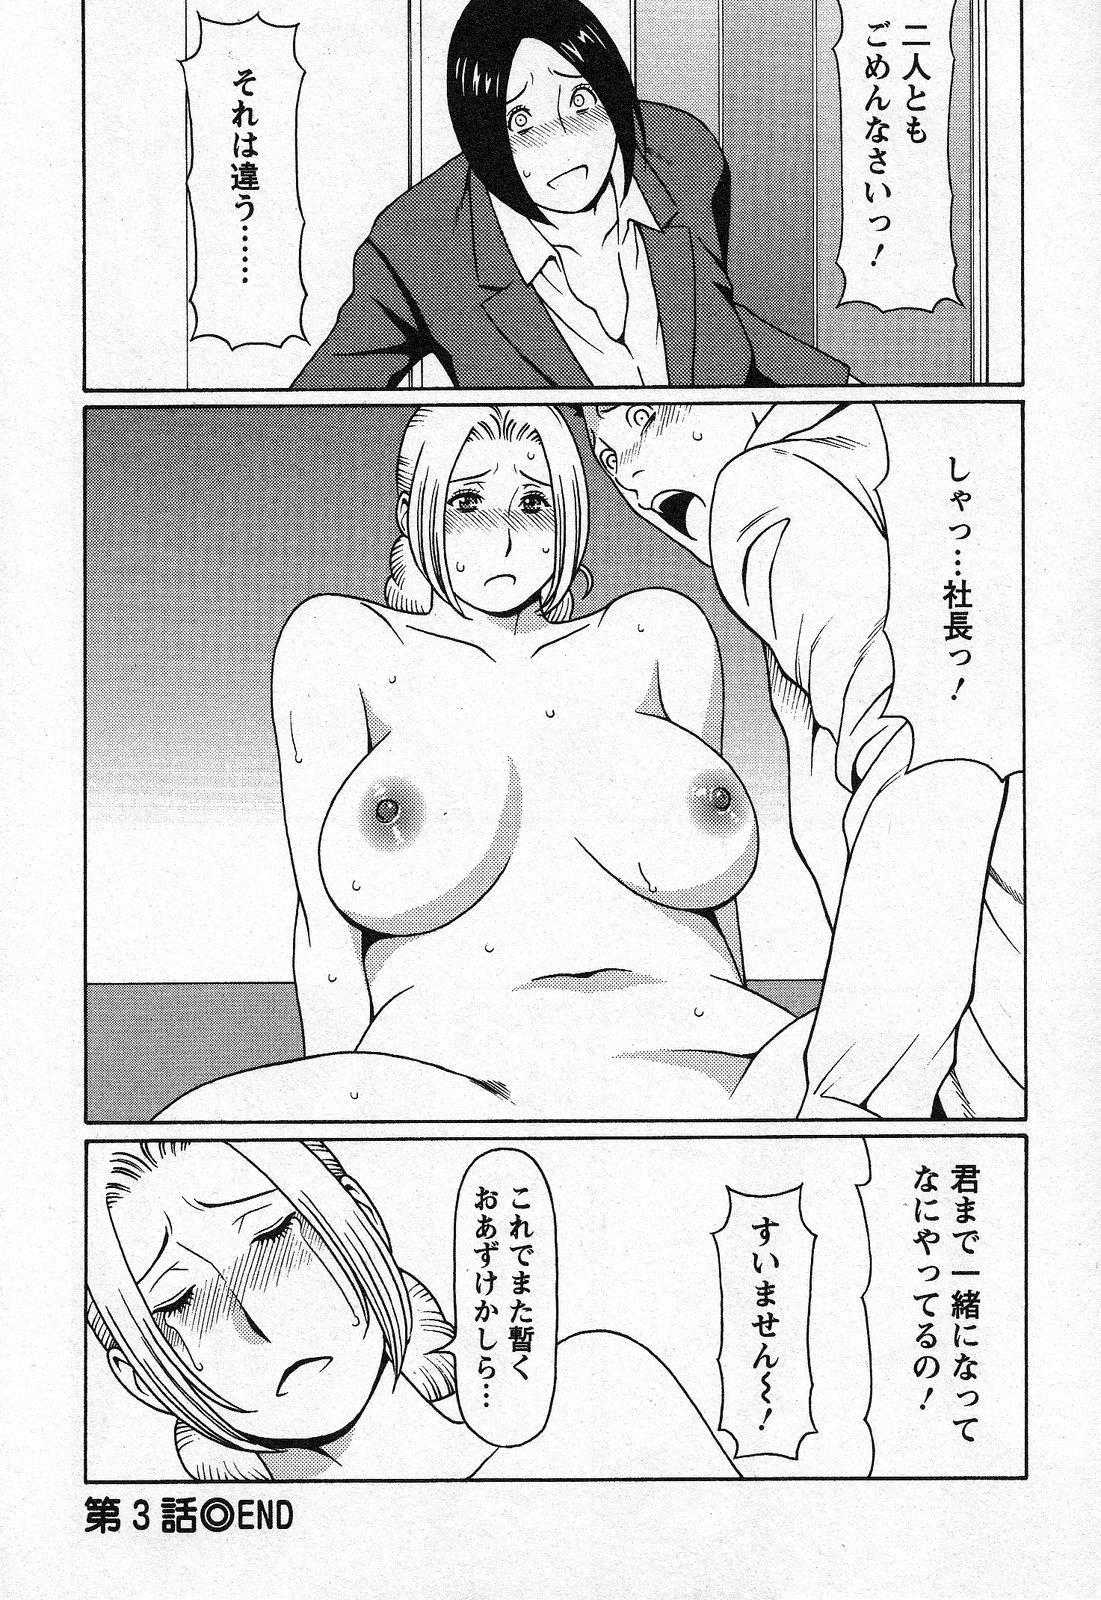 Tenshi ni Omakase 58